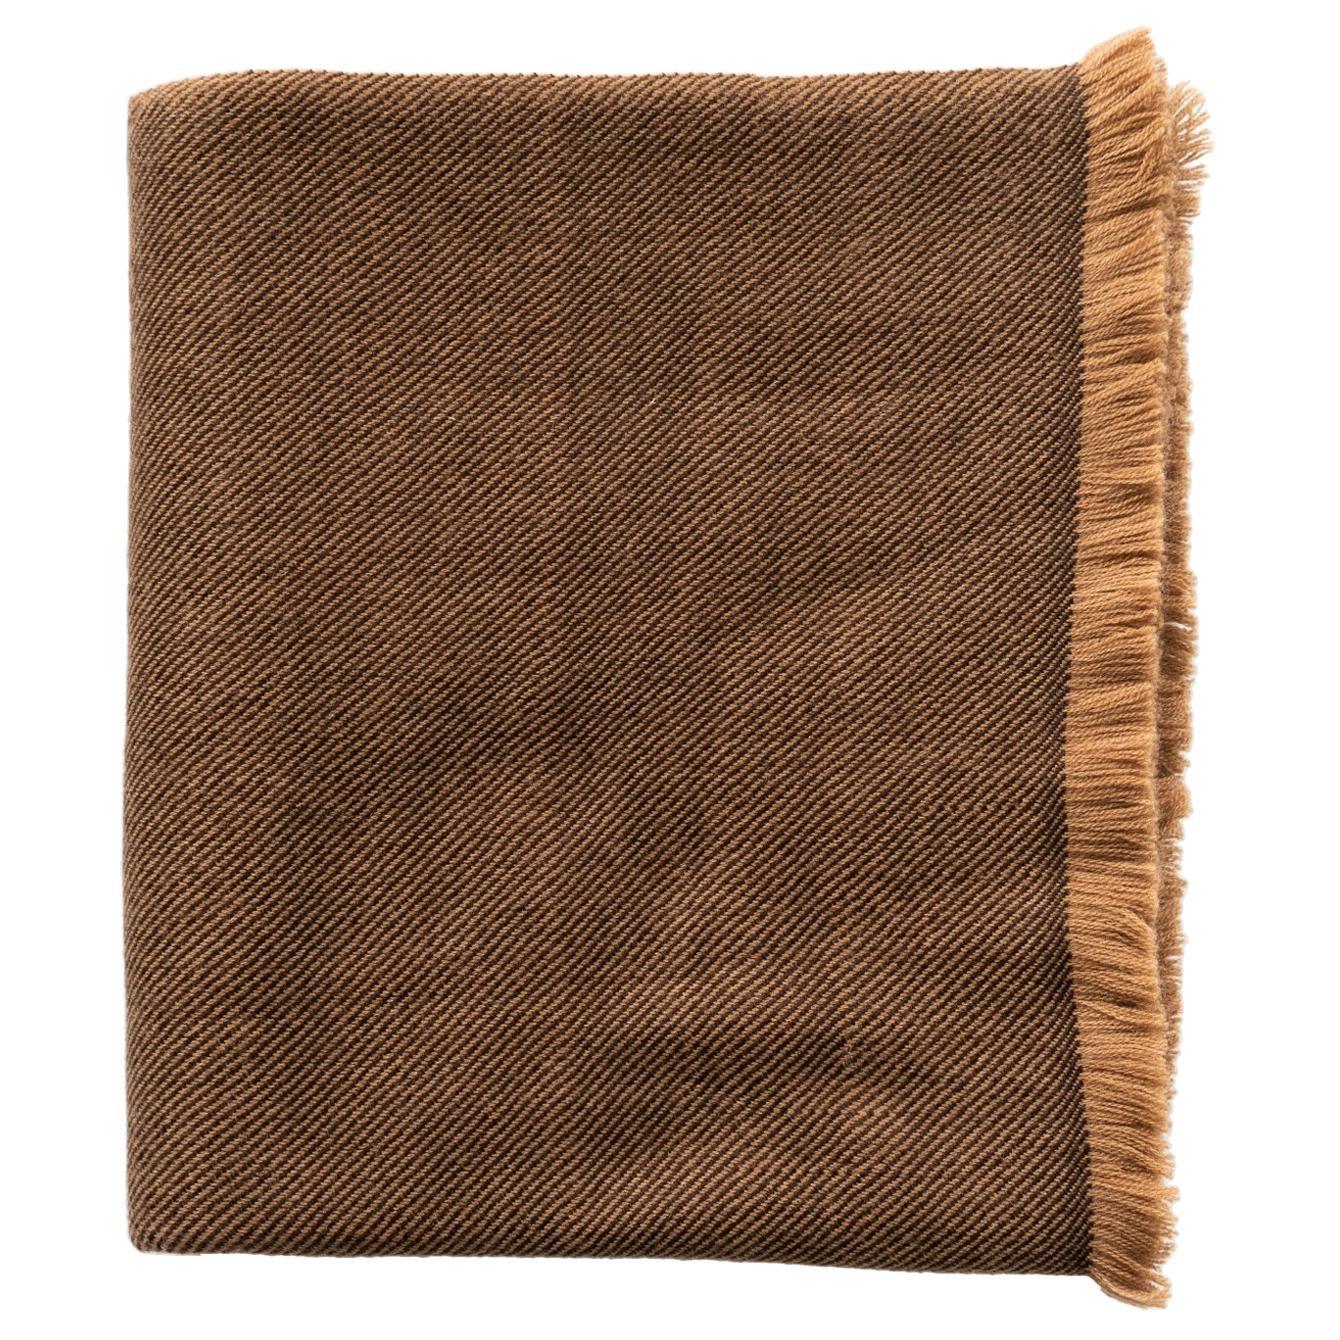 HAY Handloom  Throw / Blanket In Shades of Brown , Soft Merino Twill Weave